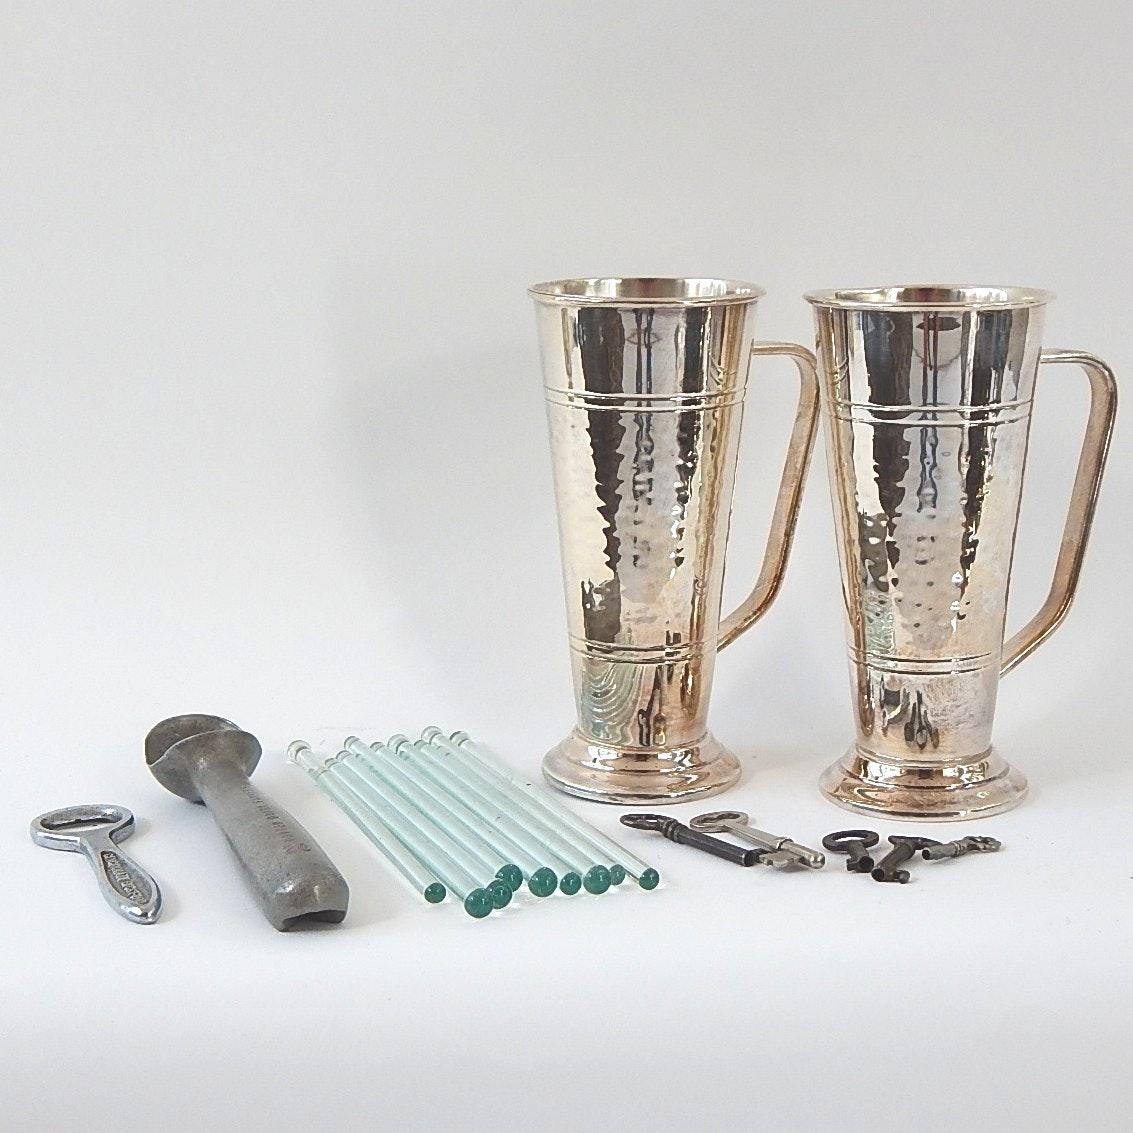 Assortment of Kitchenalia Featuring Em-Ess Silverware